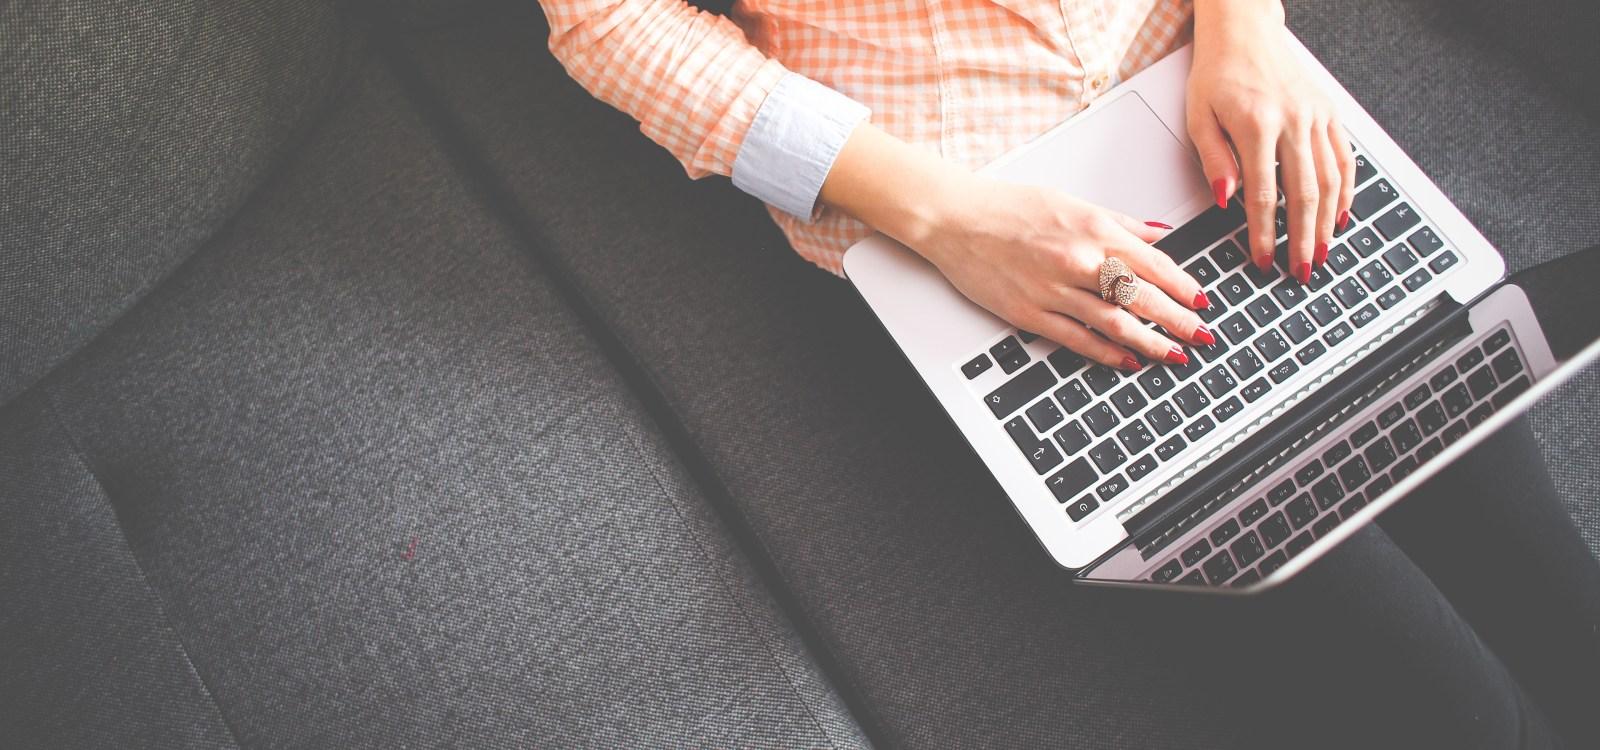 Blog Ideas For Nonprofits